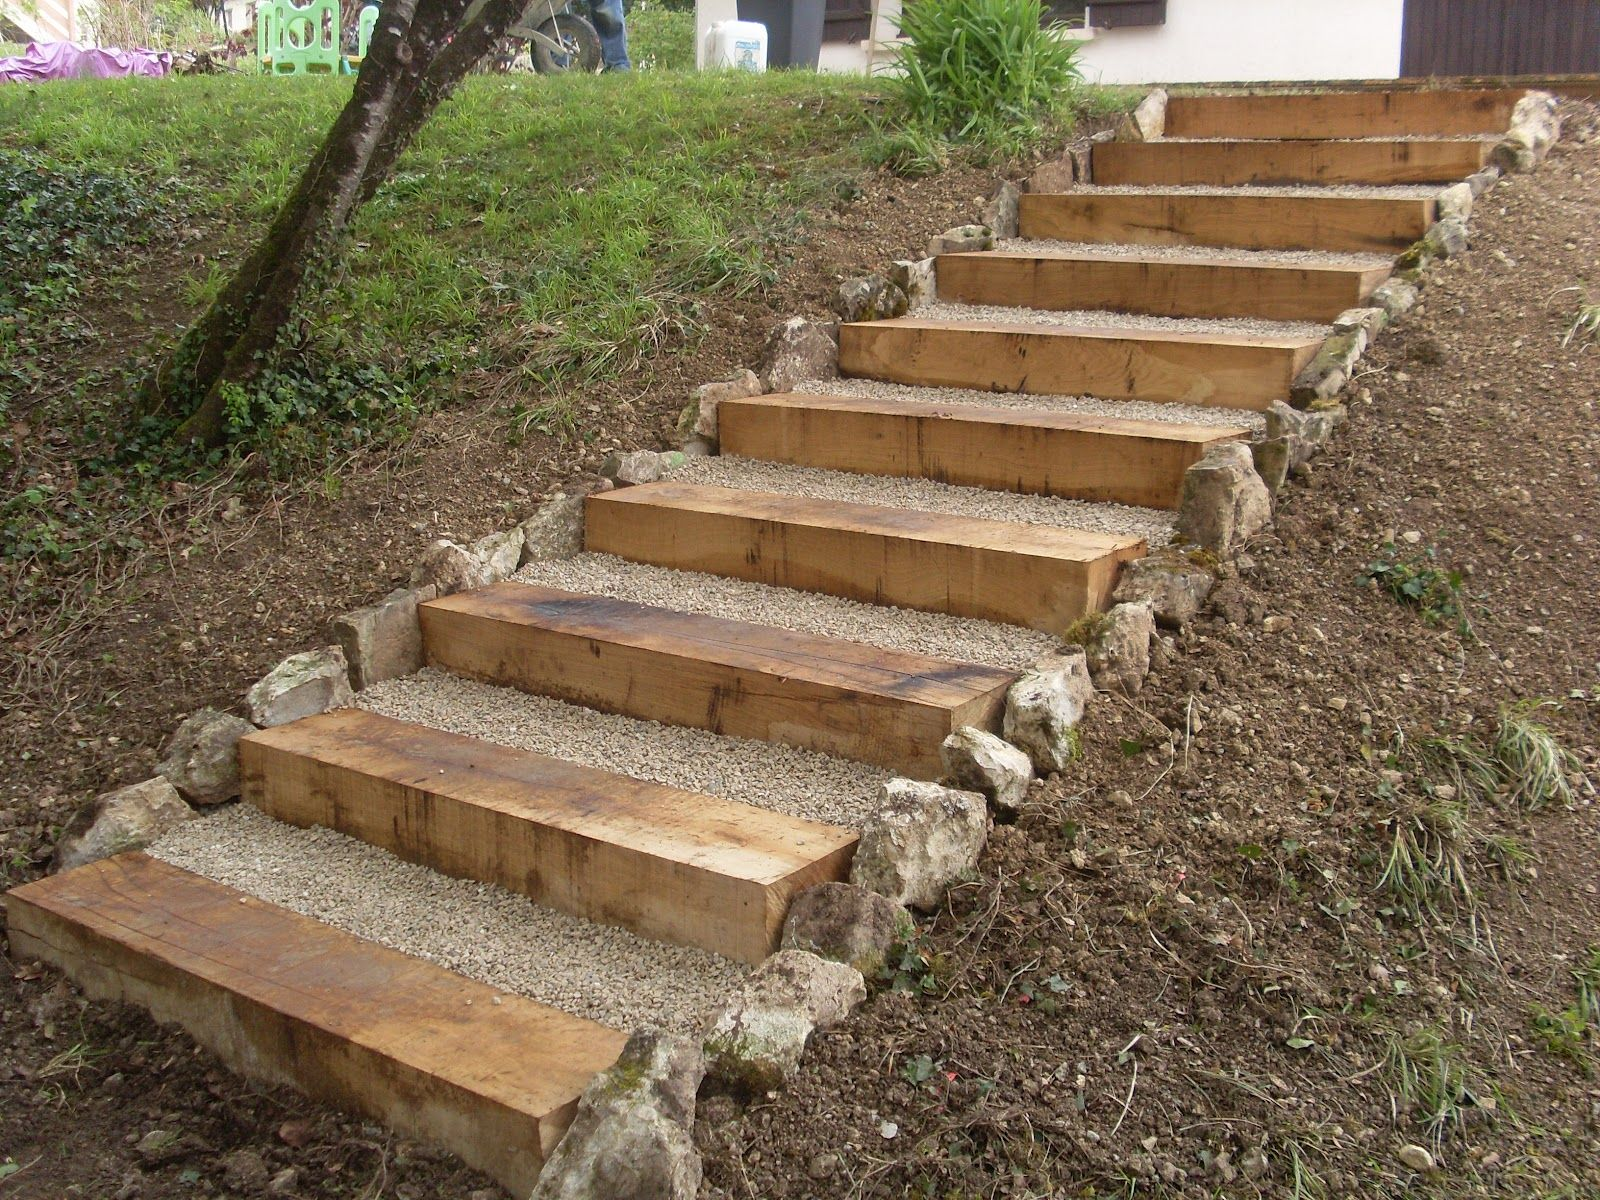 Terrasse En Bois Et Escalier En Traverse Bois Garden Stairs Home Landscaping Garden Steps